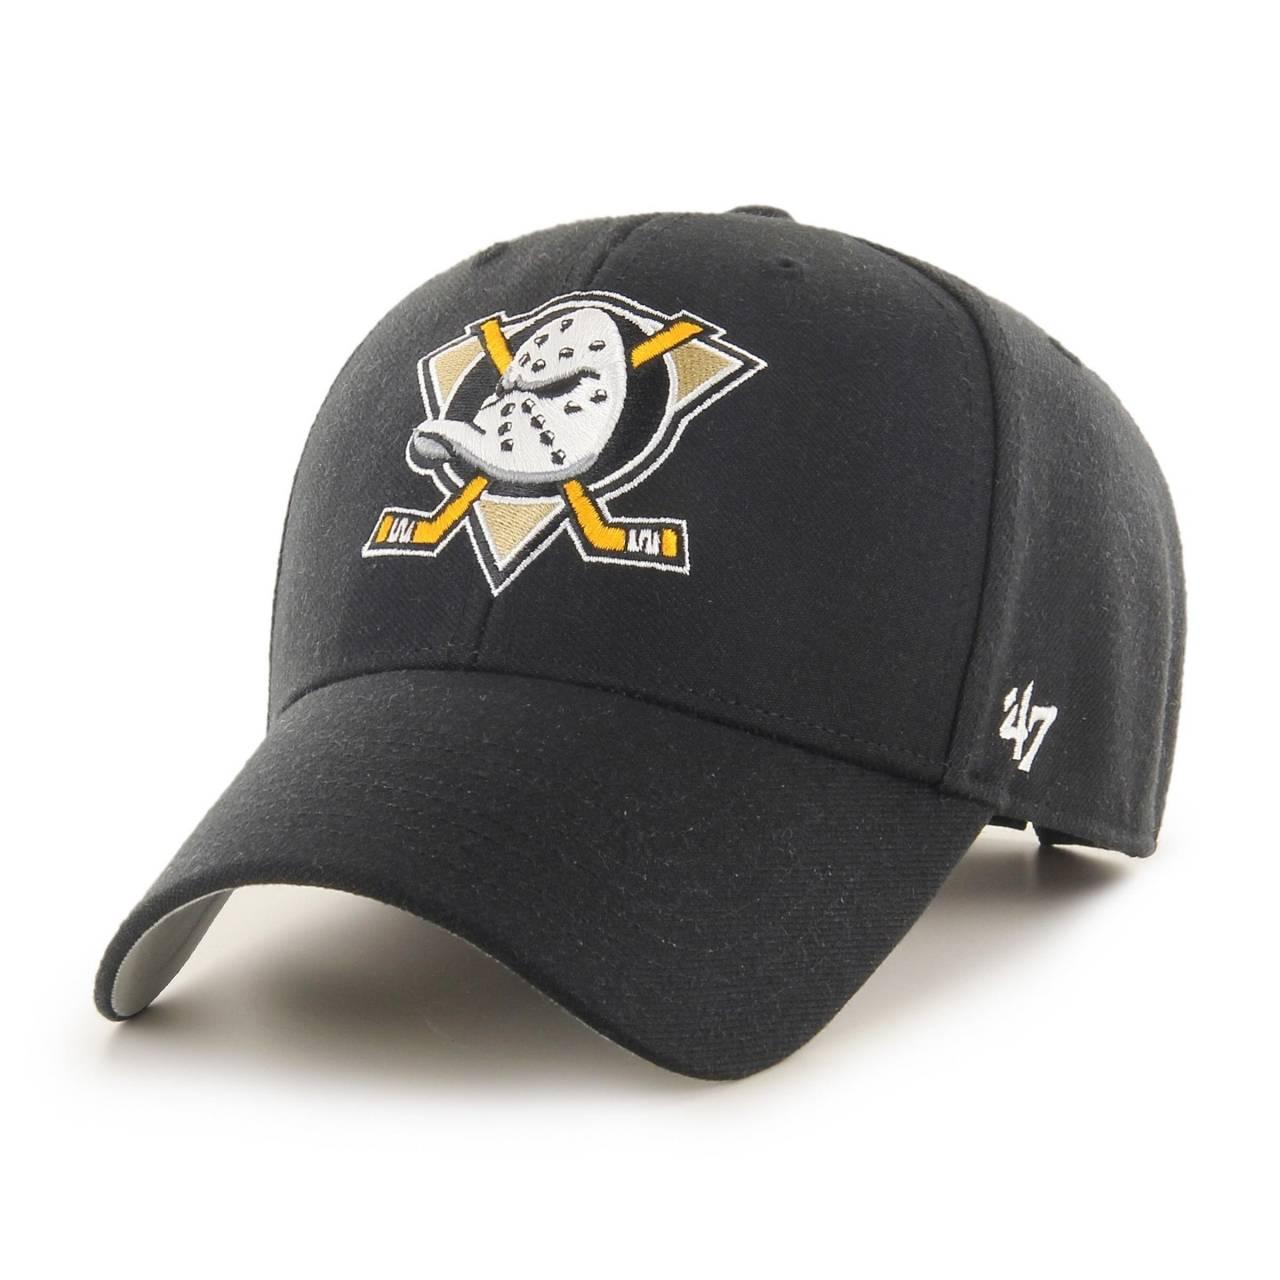 NHL ANAHEIM DUCKS '47 MVP CAP